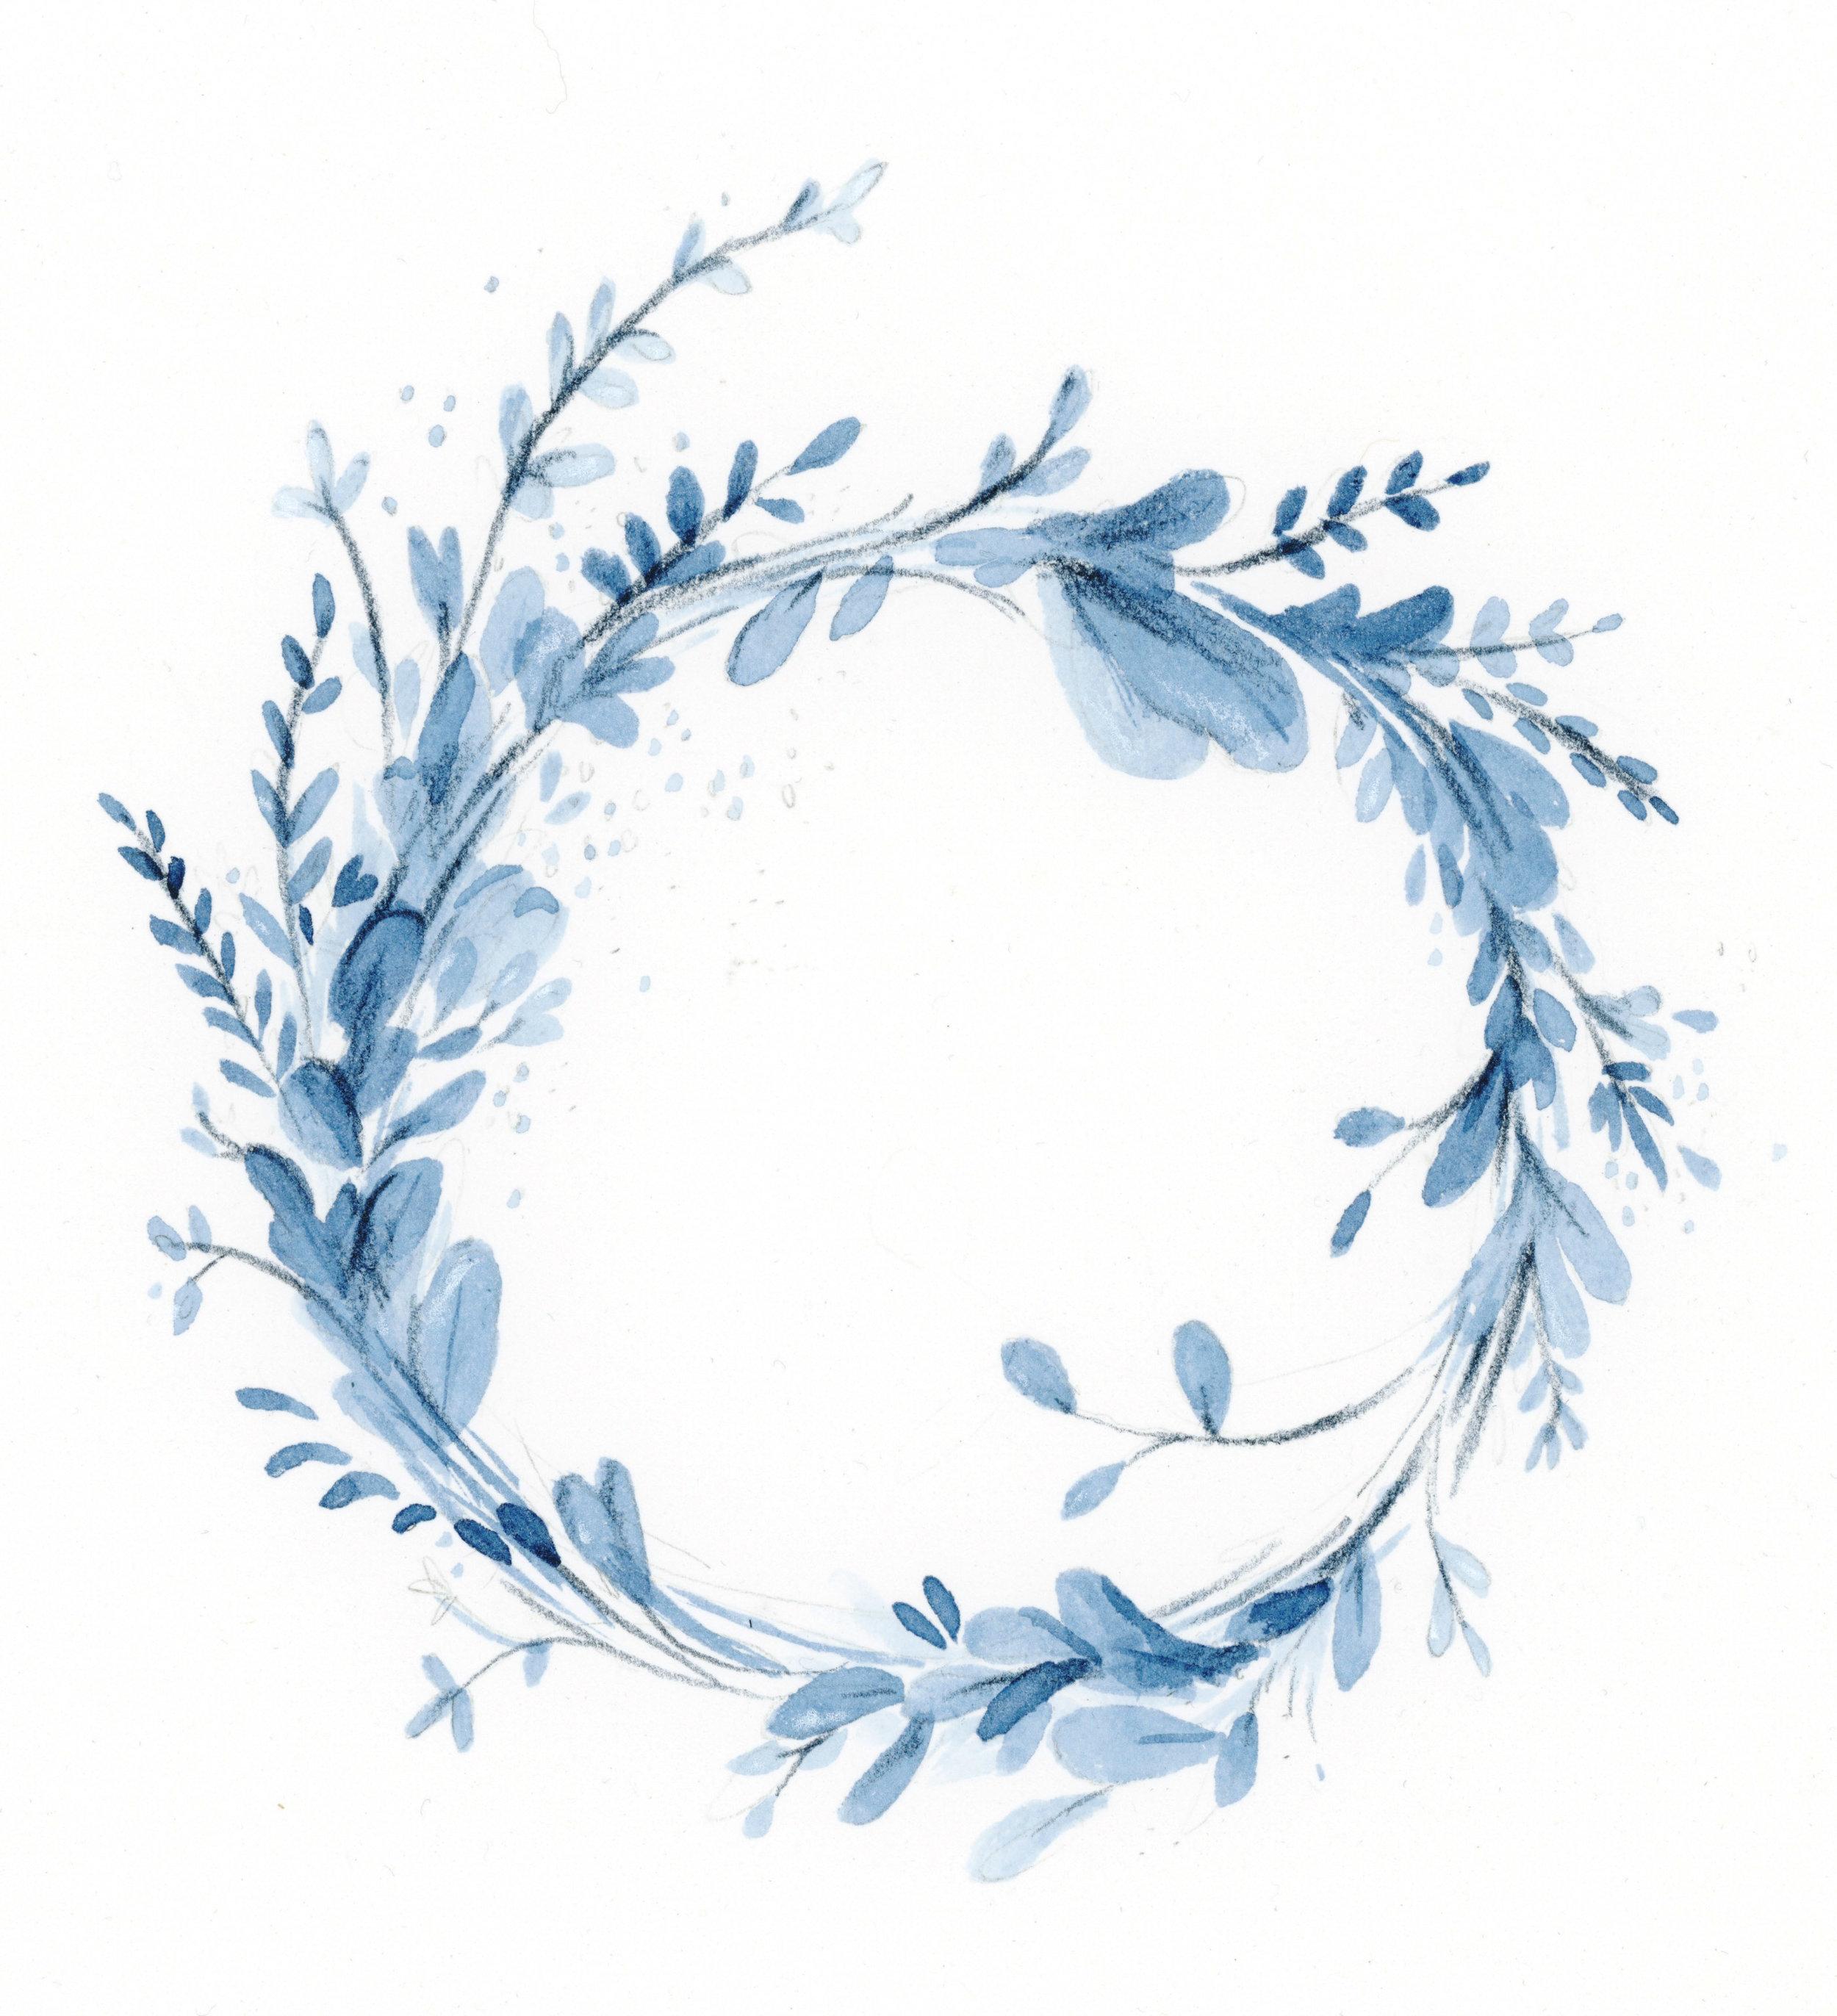 KatieDeYoe_Wreath